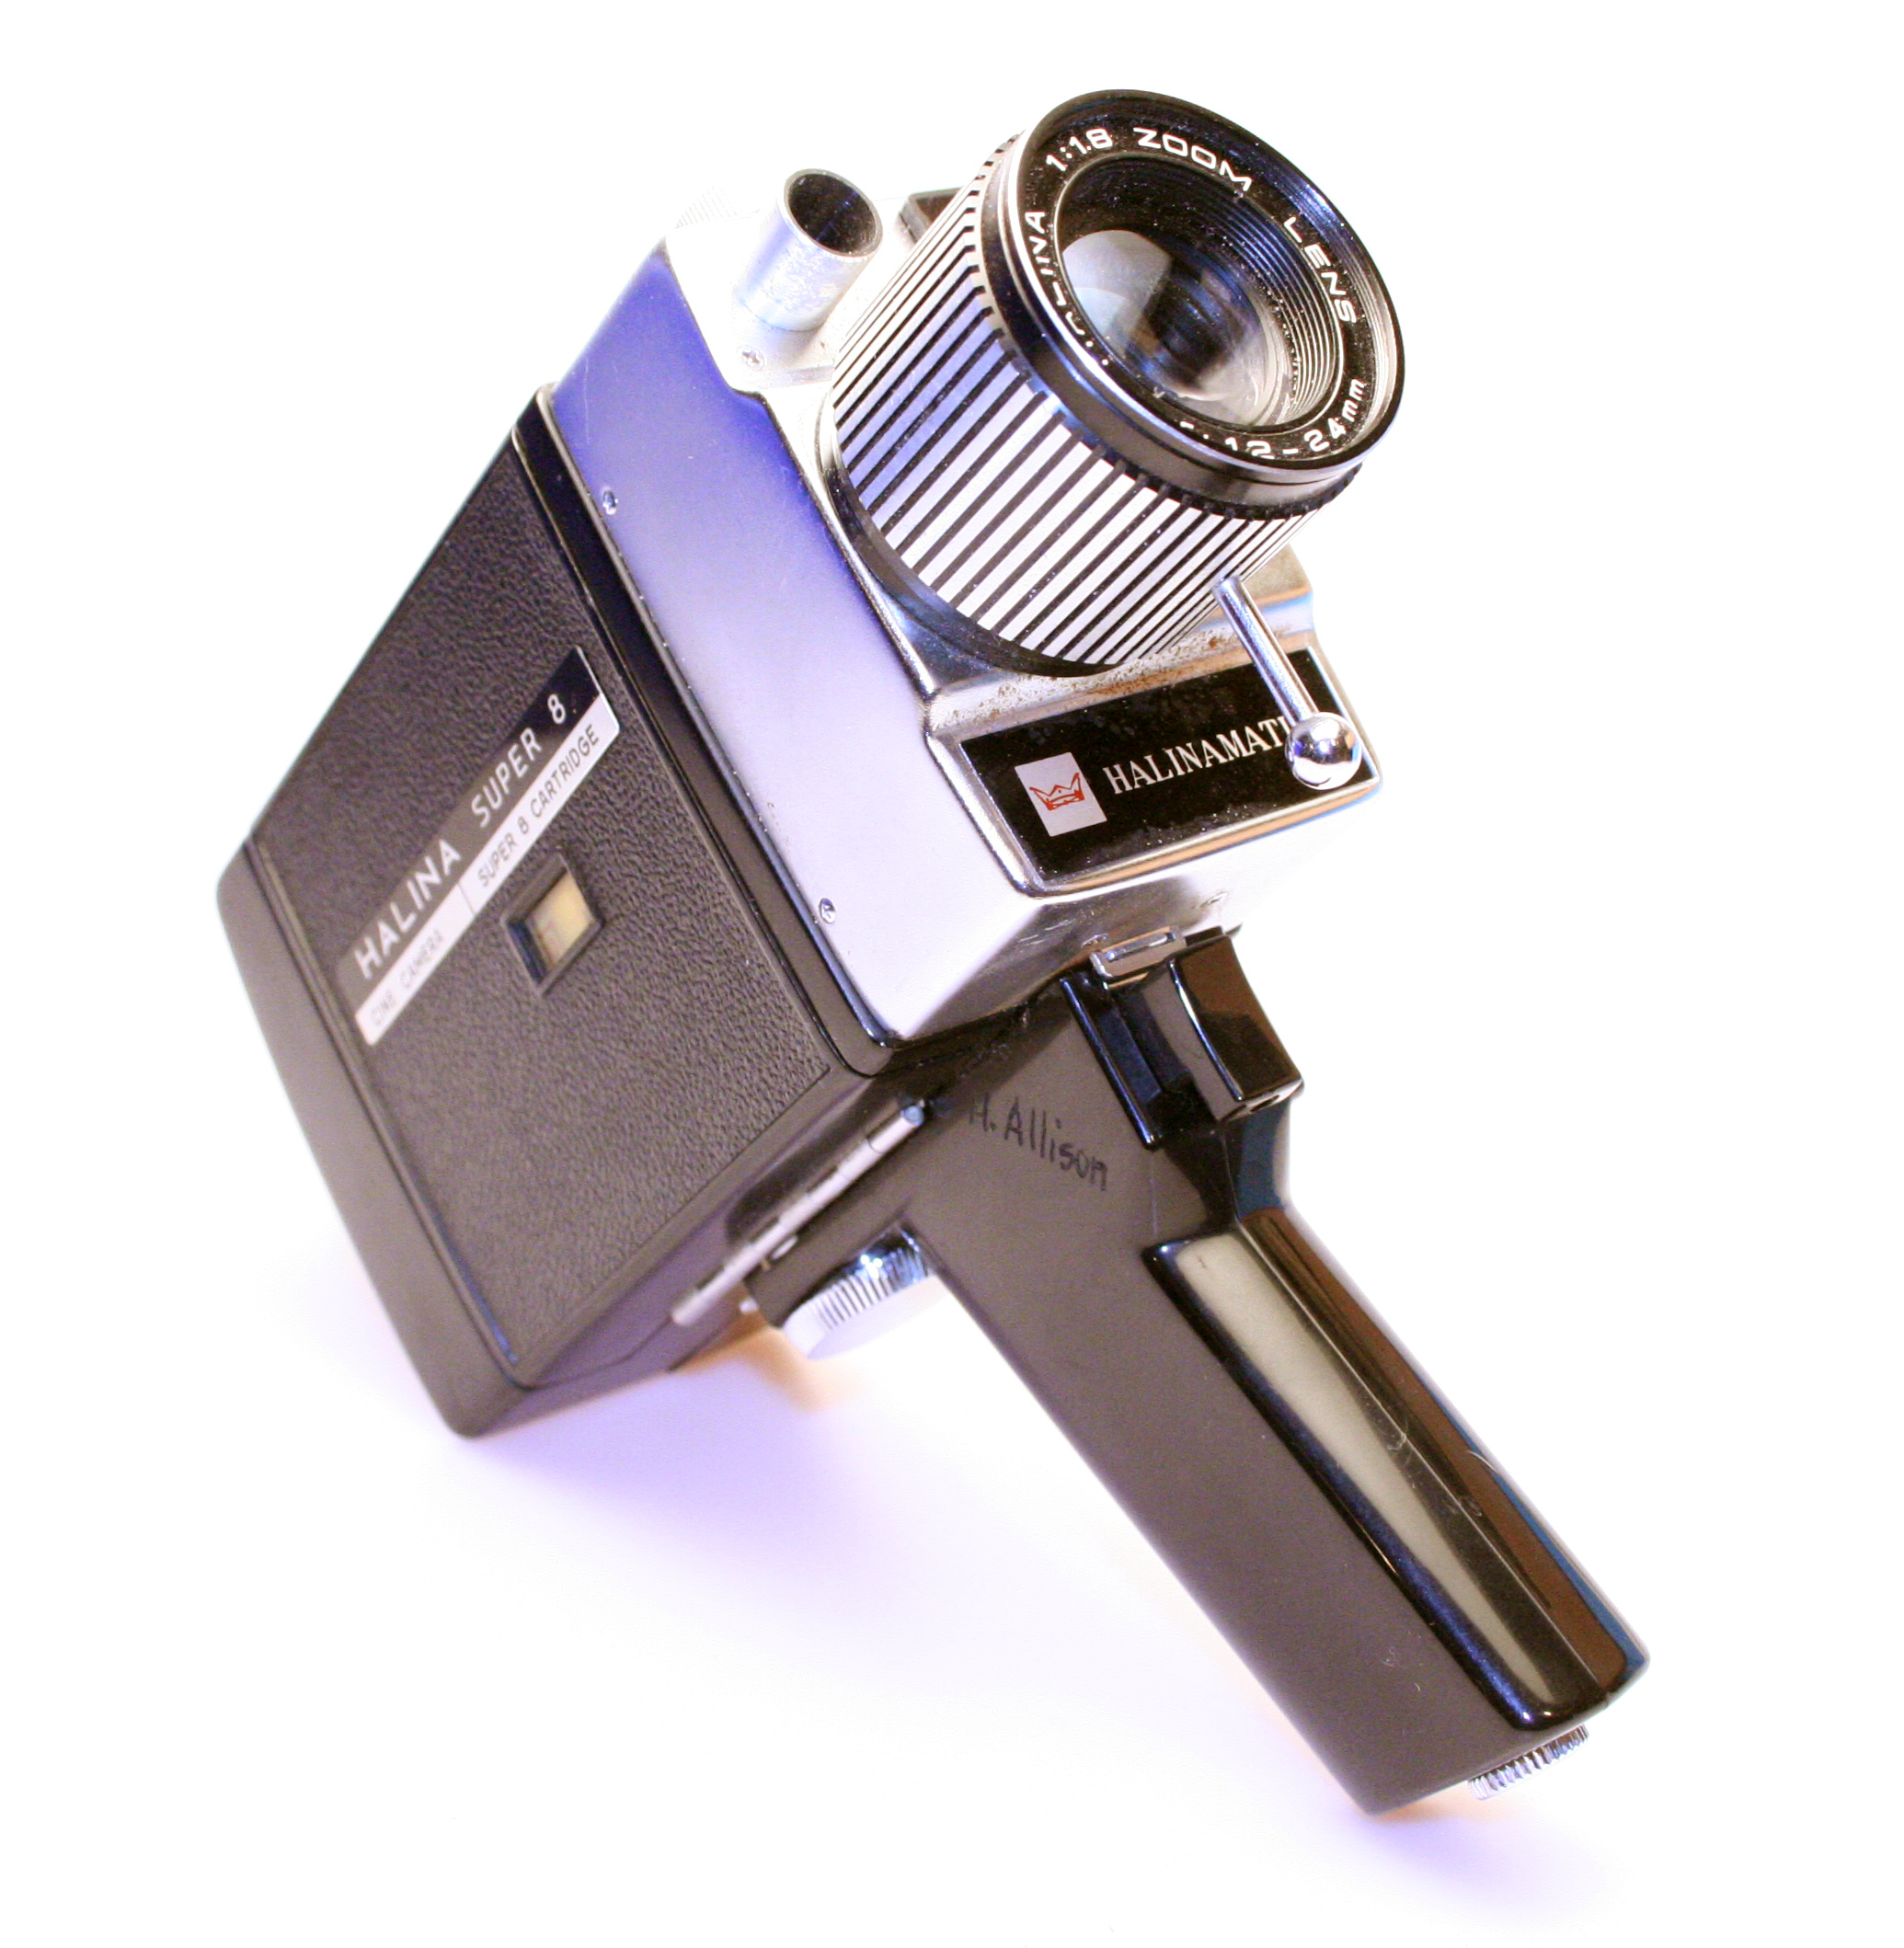 8Mm Vintage Camera 8mm halina video cameraeviln8 on deviantart